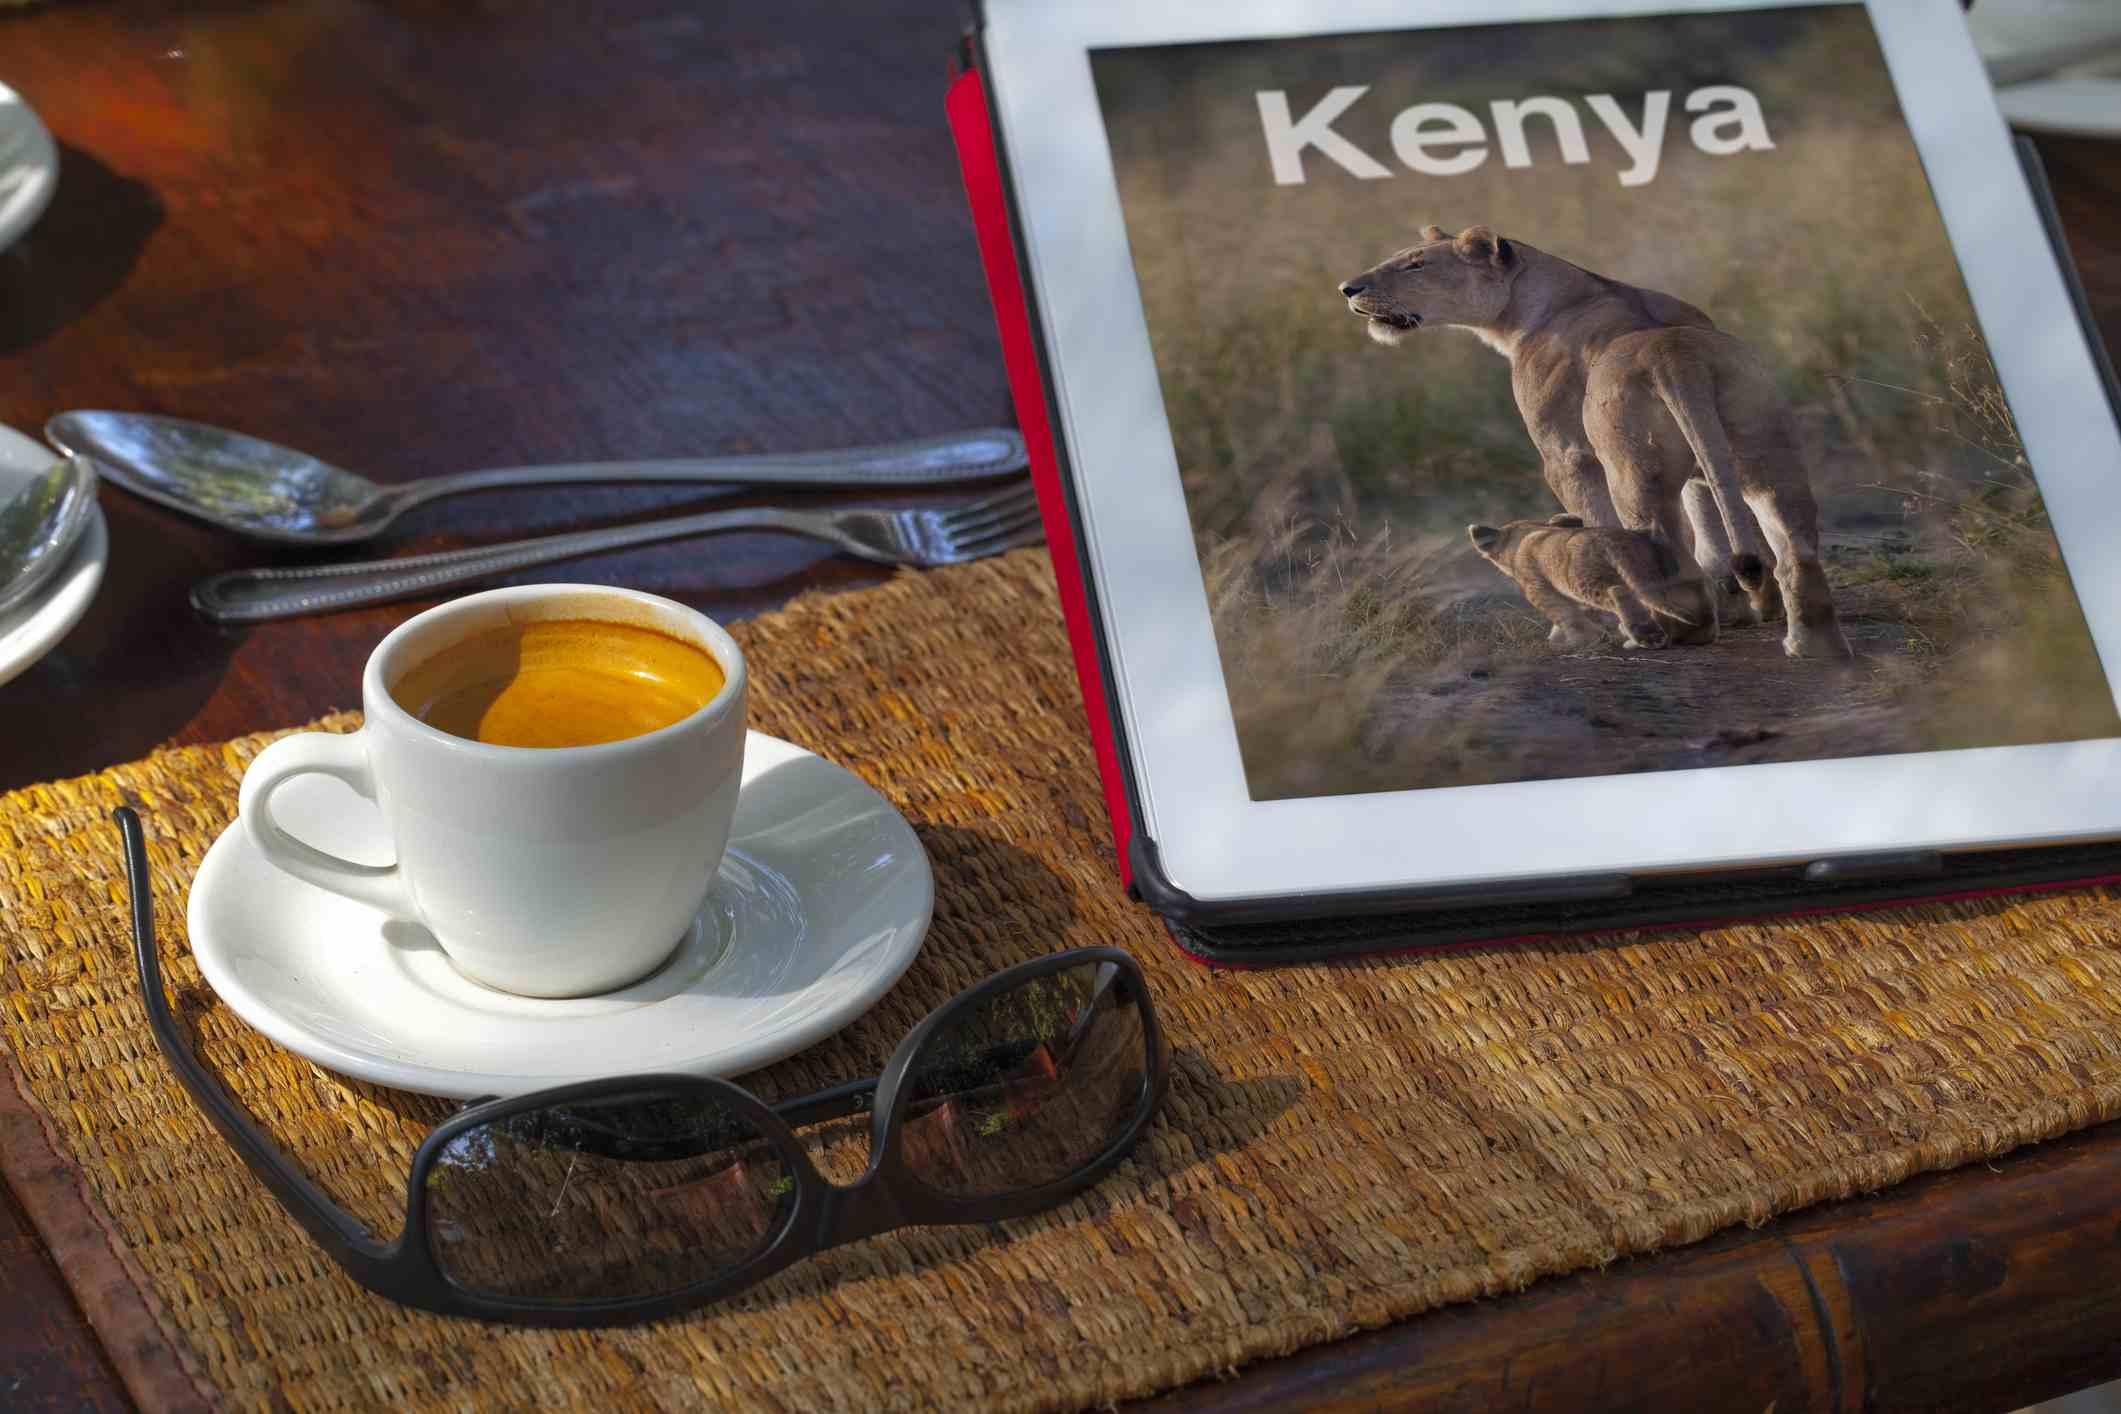 A digital travel guide beside an espresso